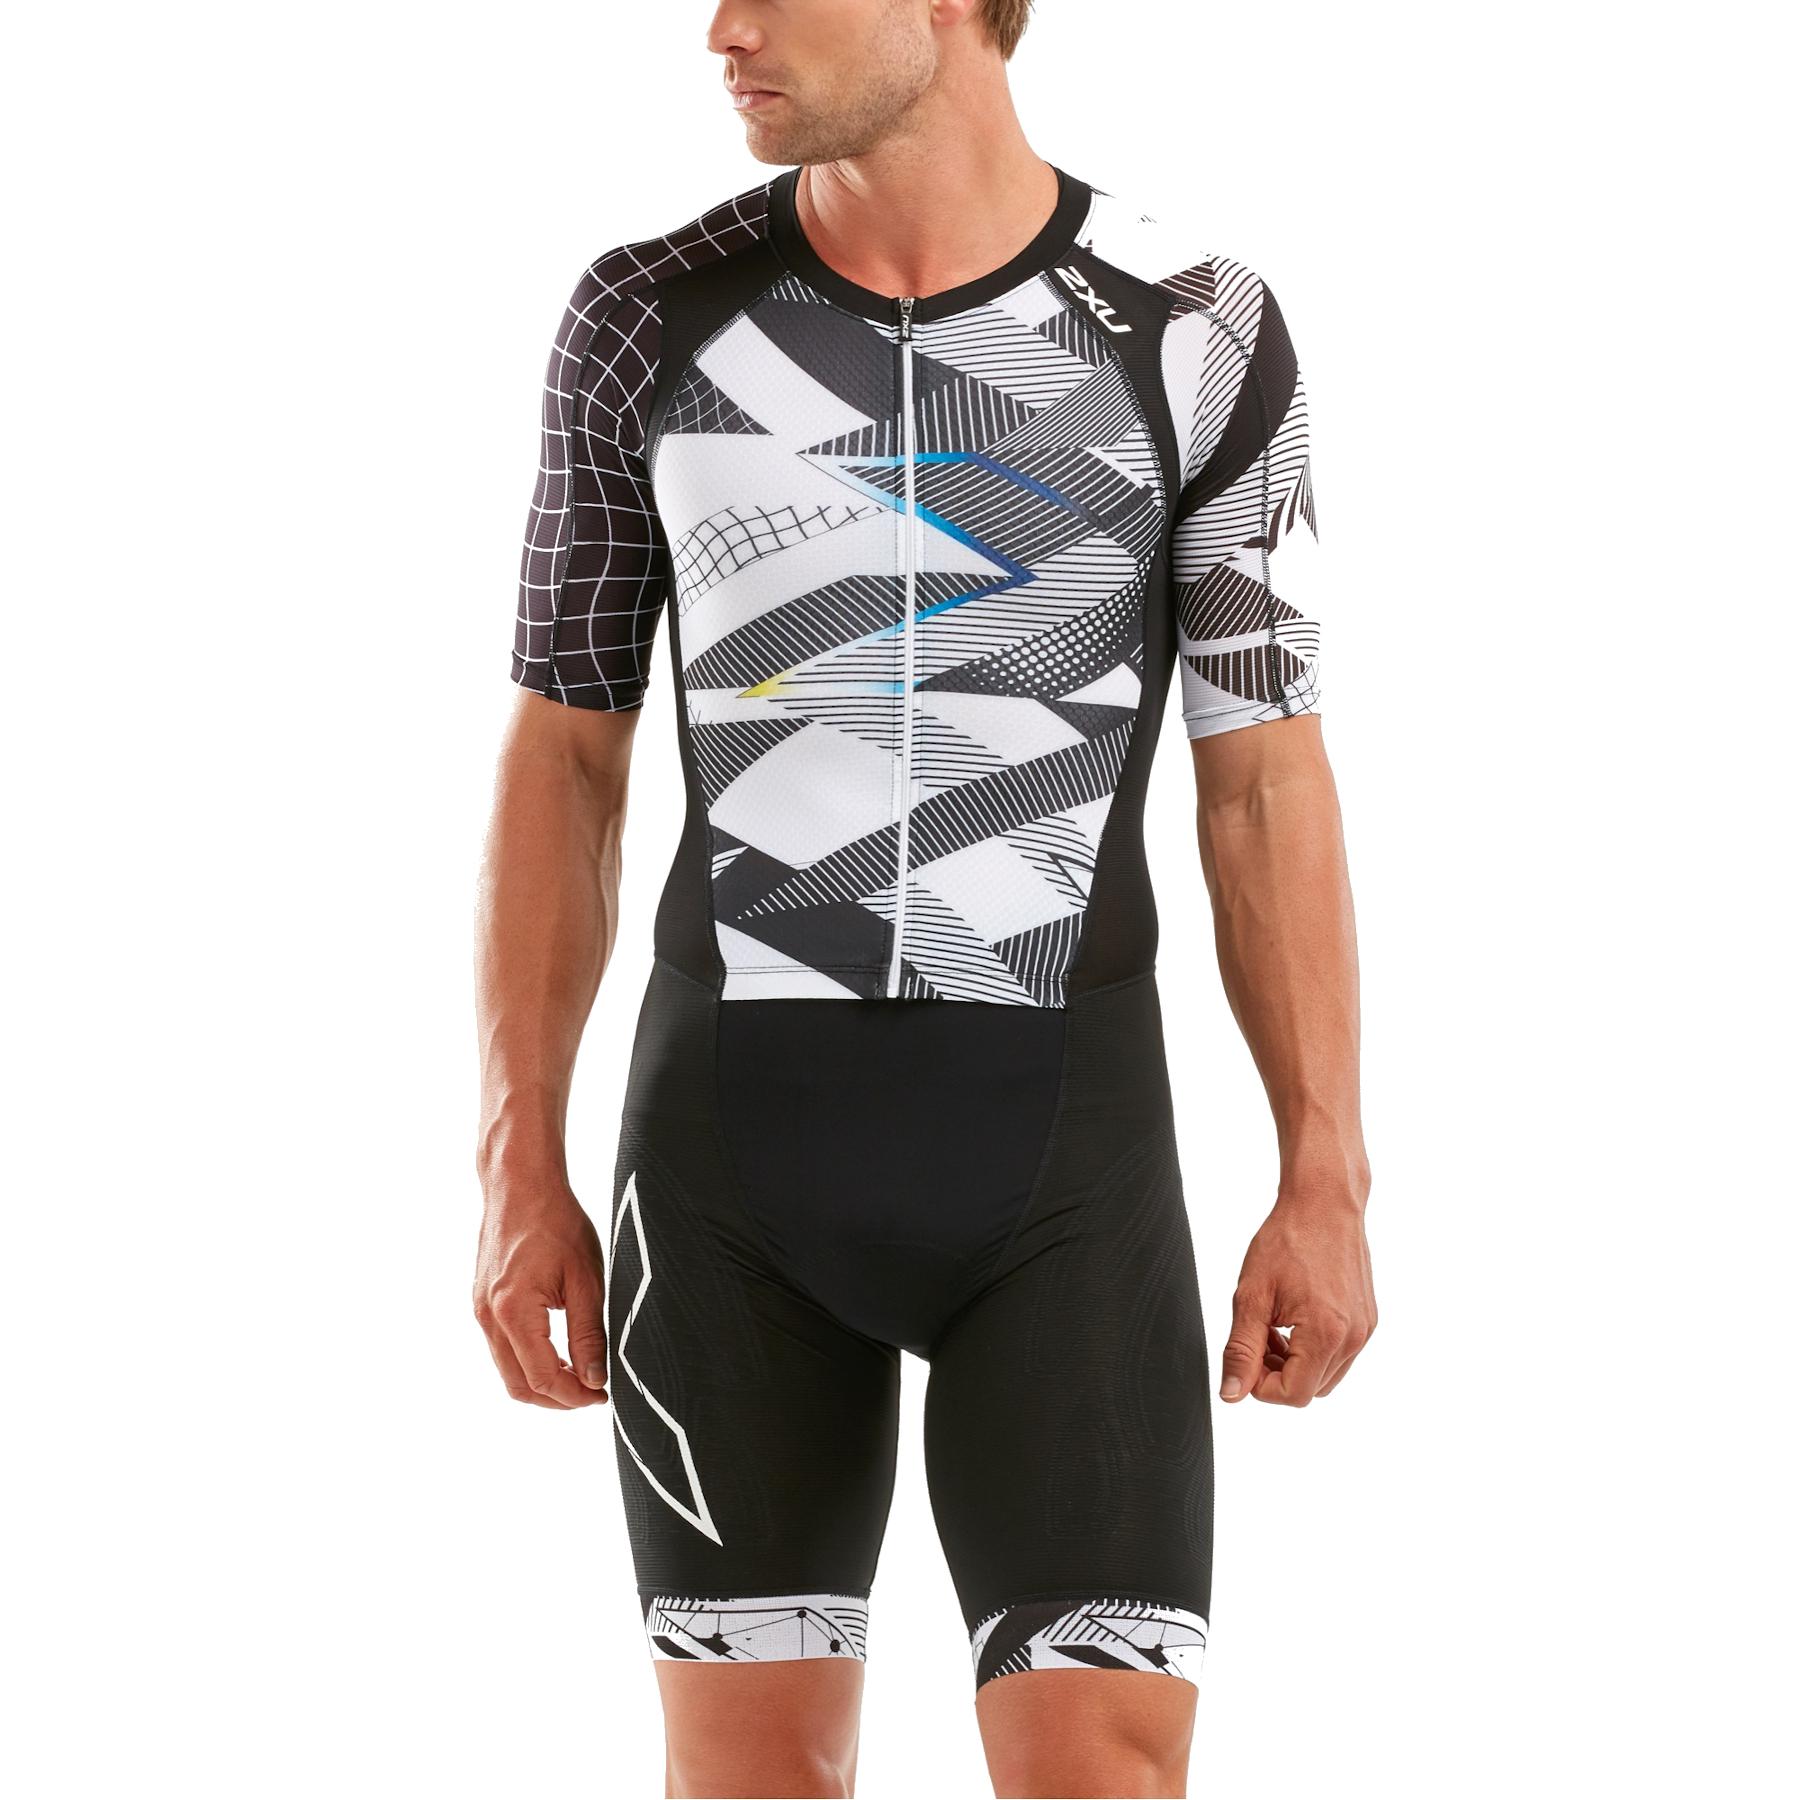 2XU Compression Full Zip Sleeved Trisuit - black/chroma